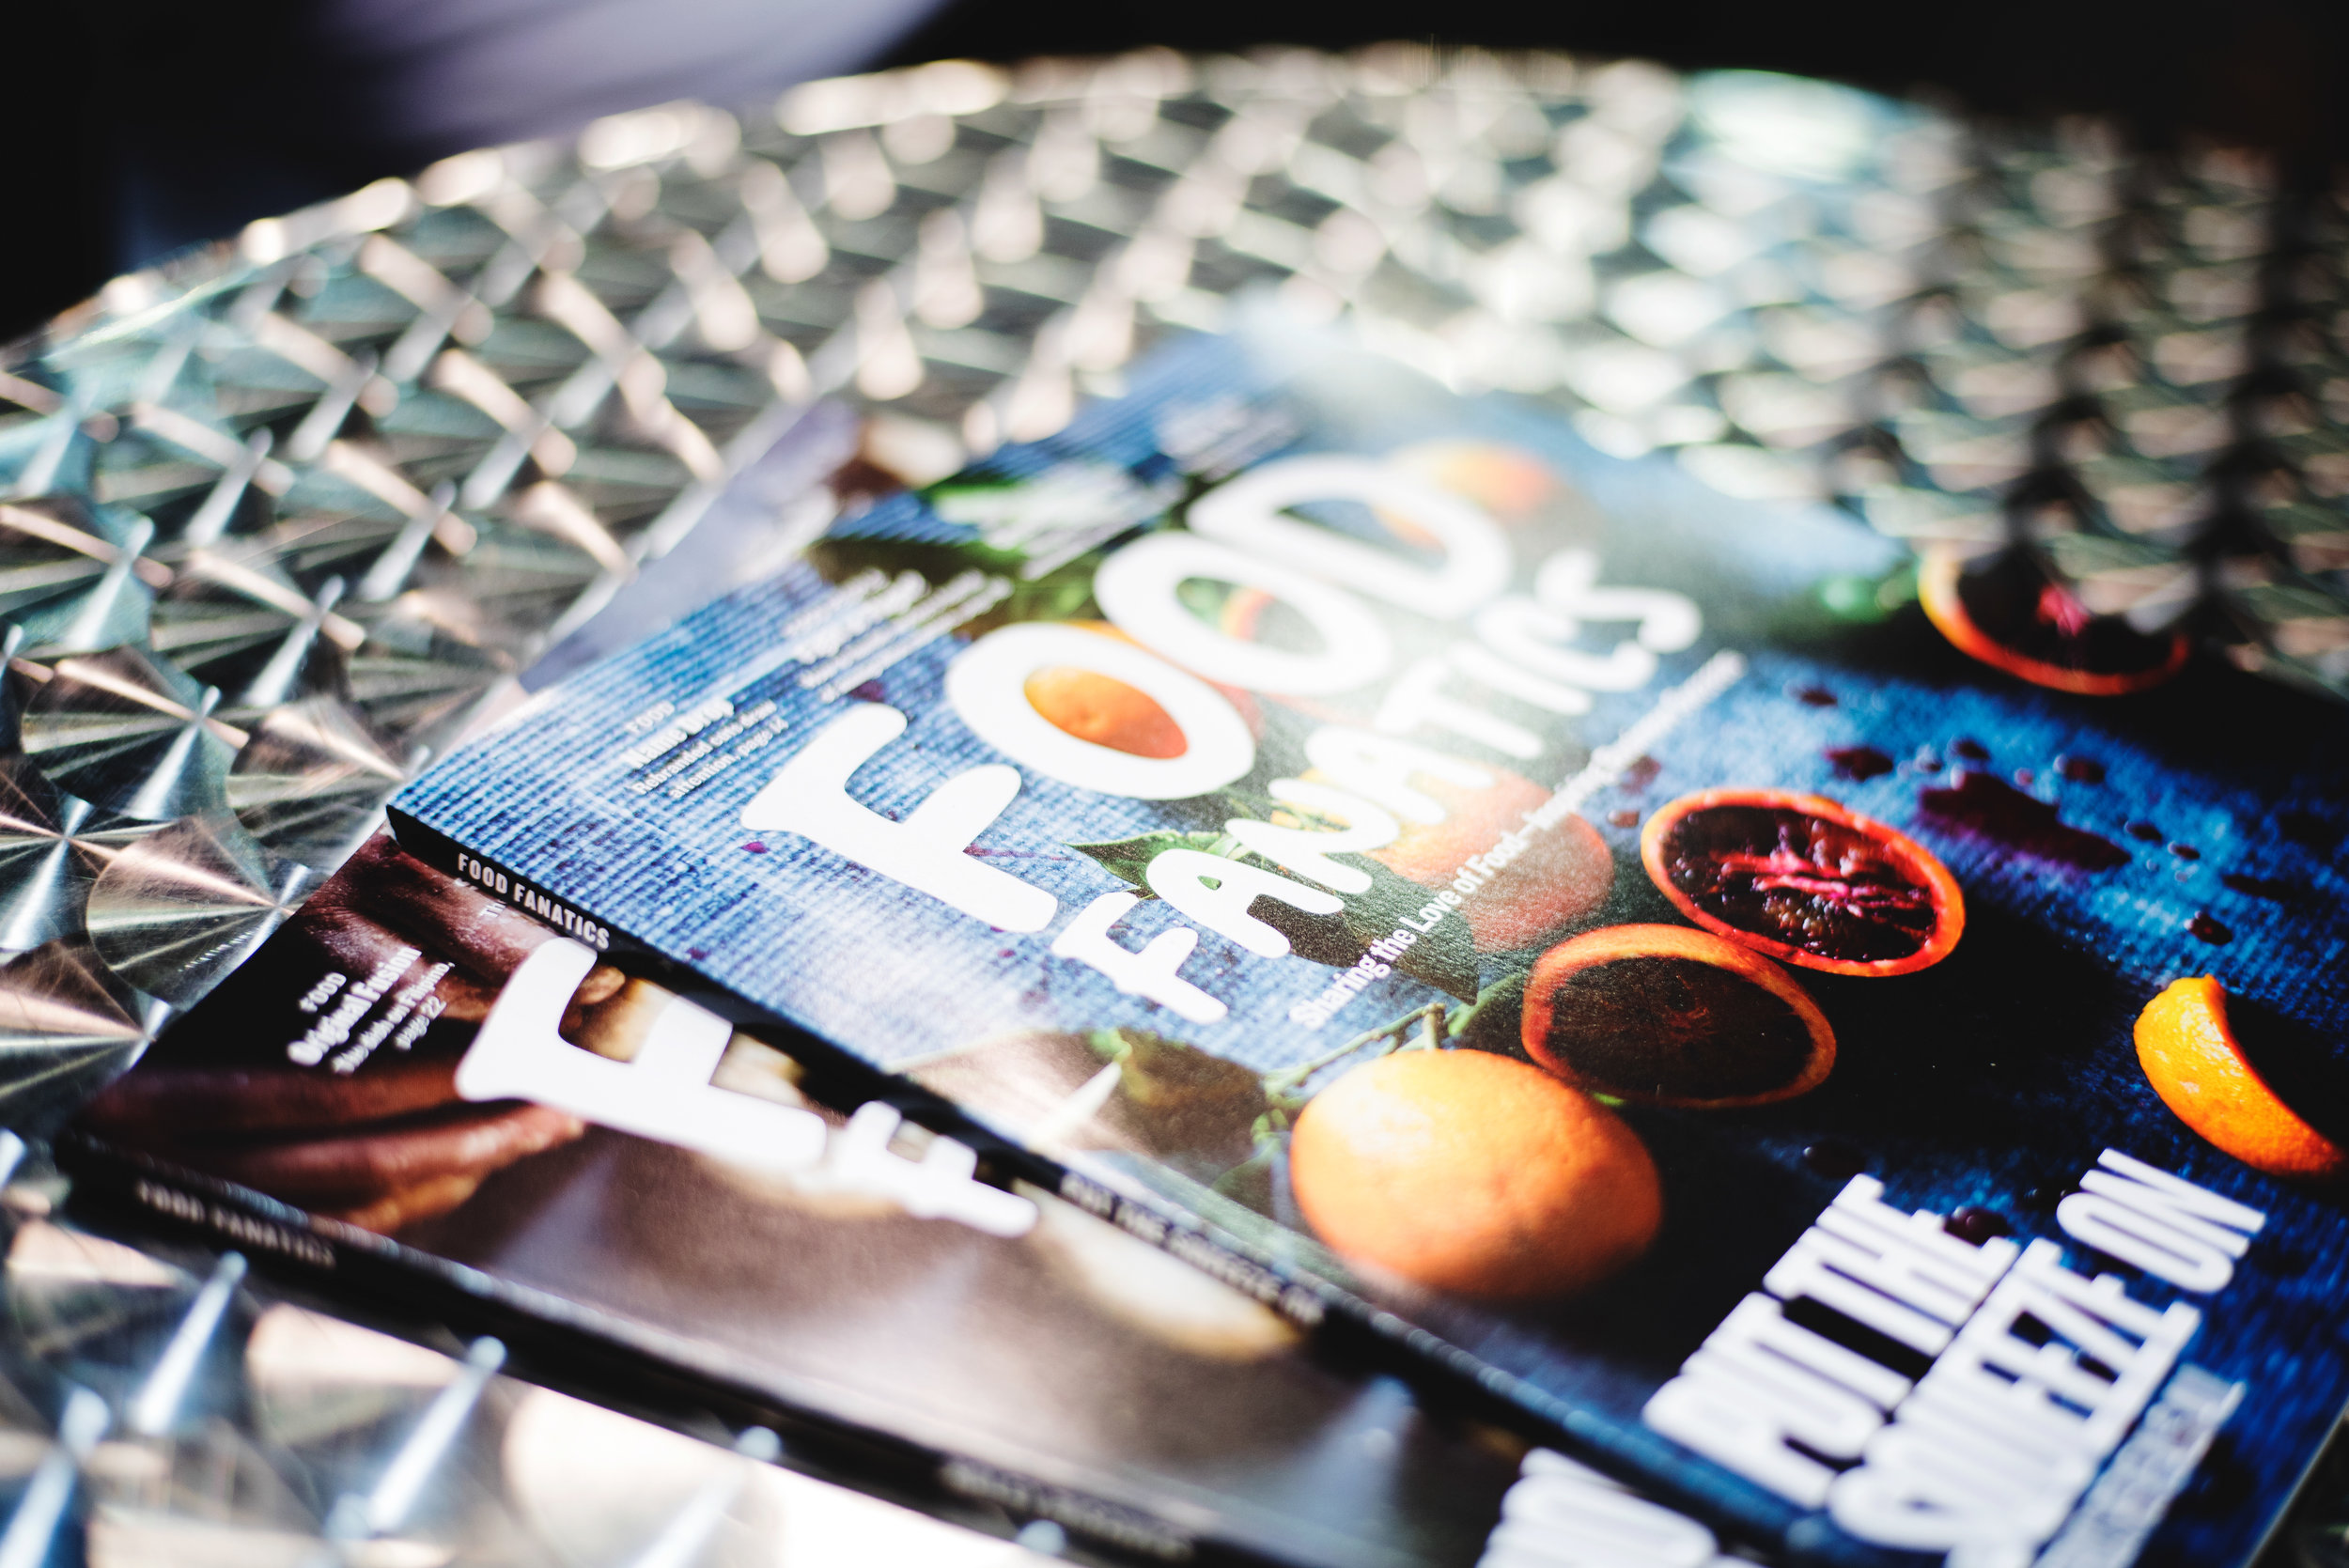 FoodFanaticsLive-Event-Food-Photography117.jpg